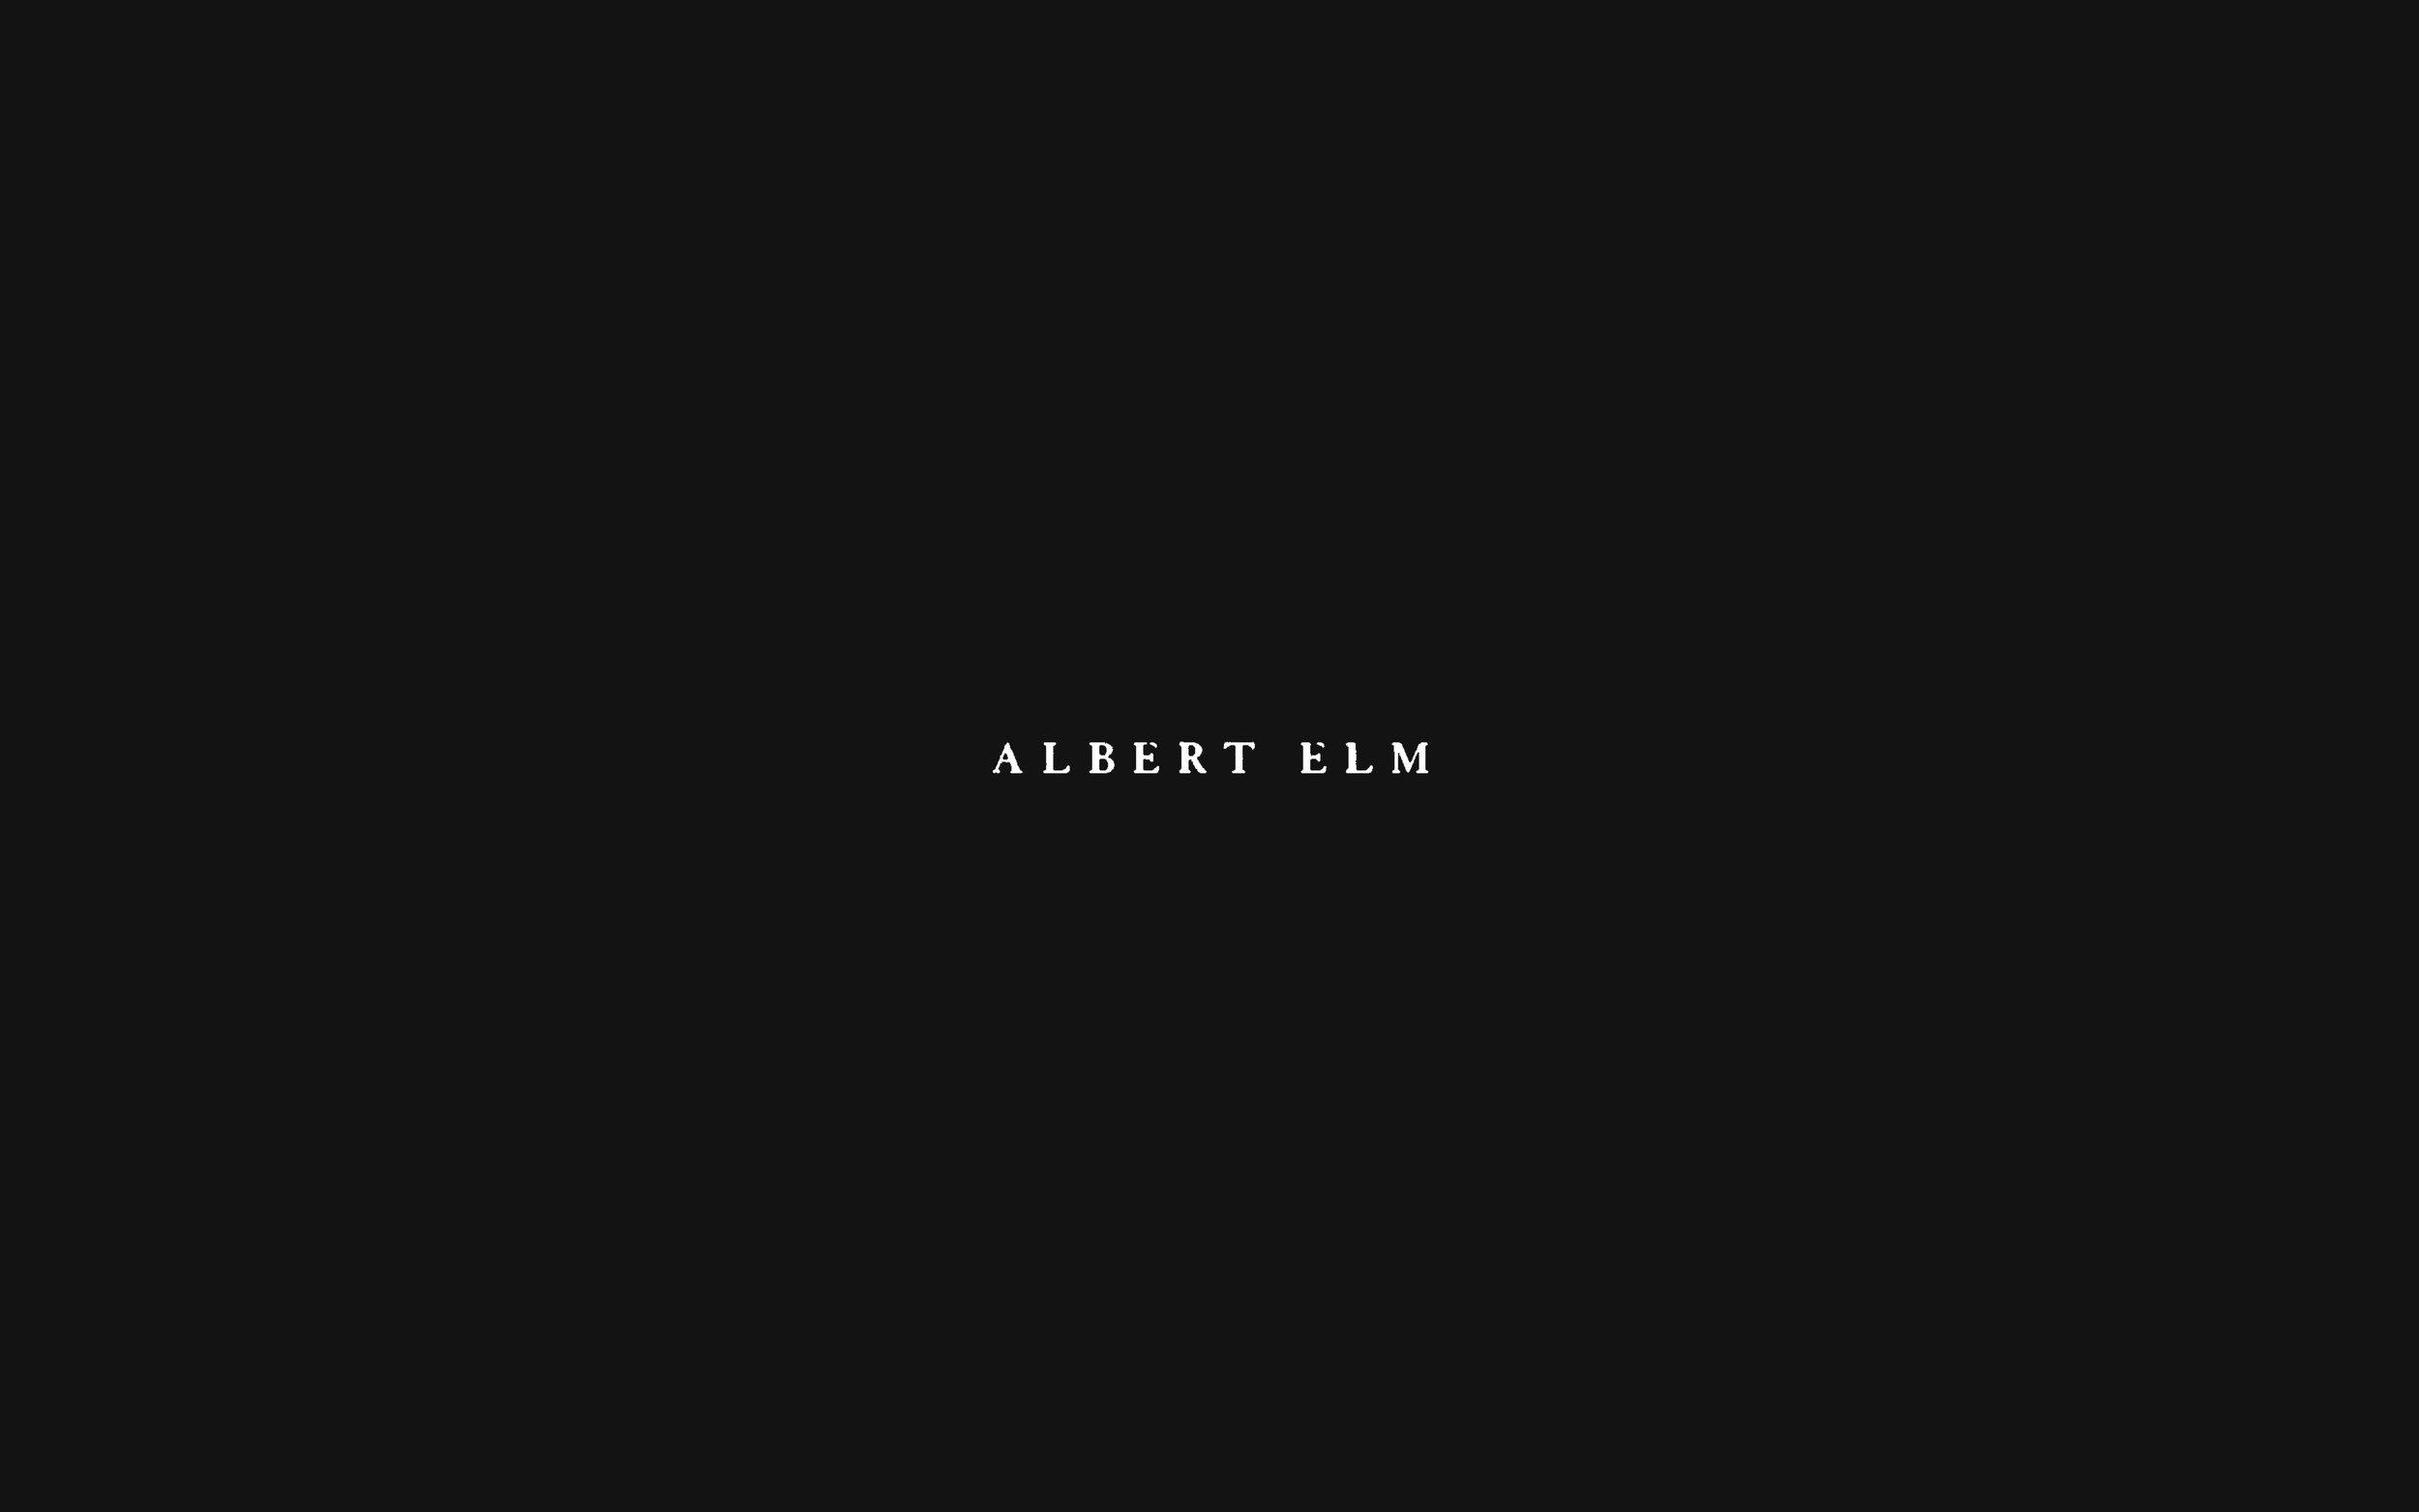 3B__Albert _Elm_00.jpg